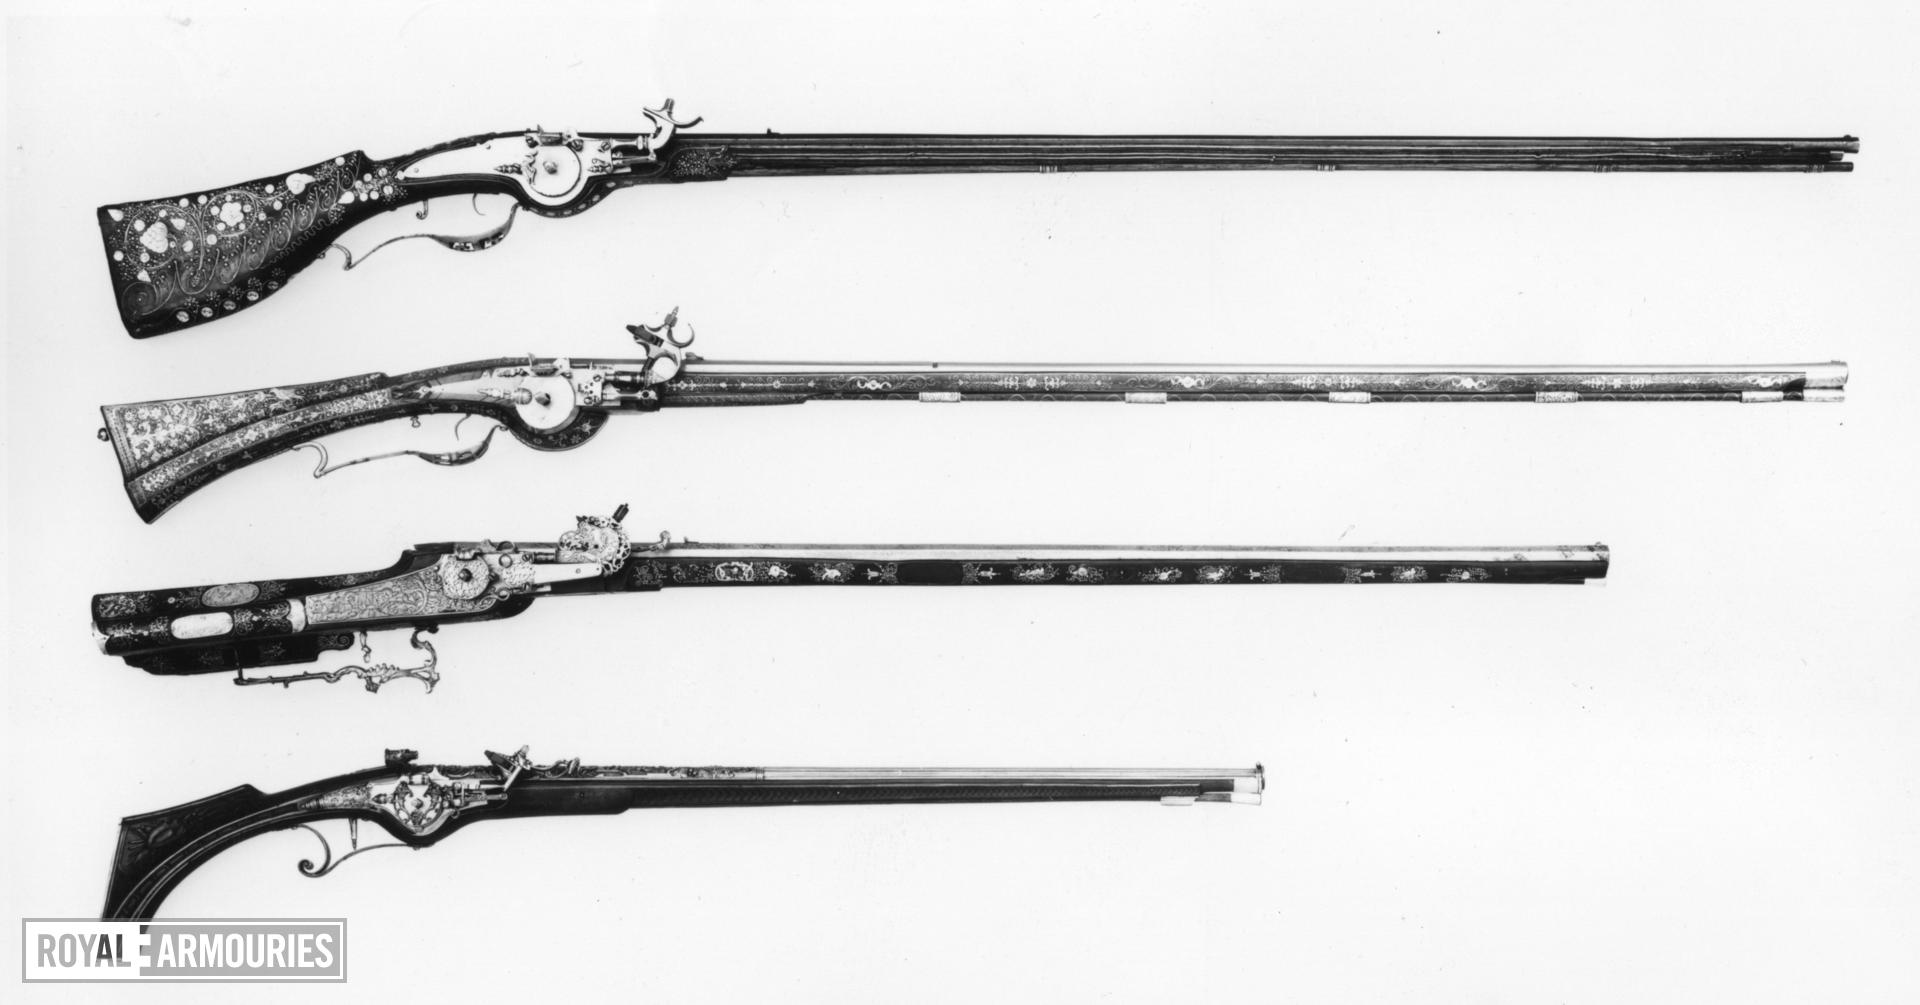 Wheellock sporting gun - By Nicolas Kevcks